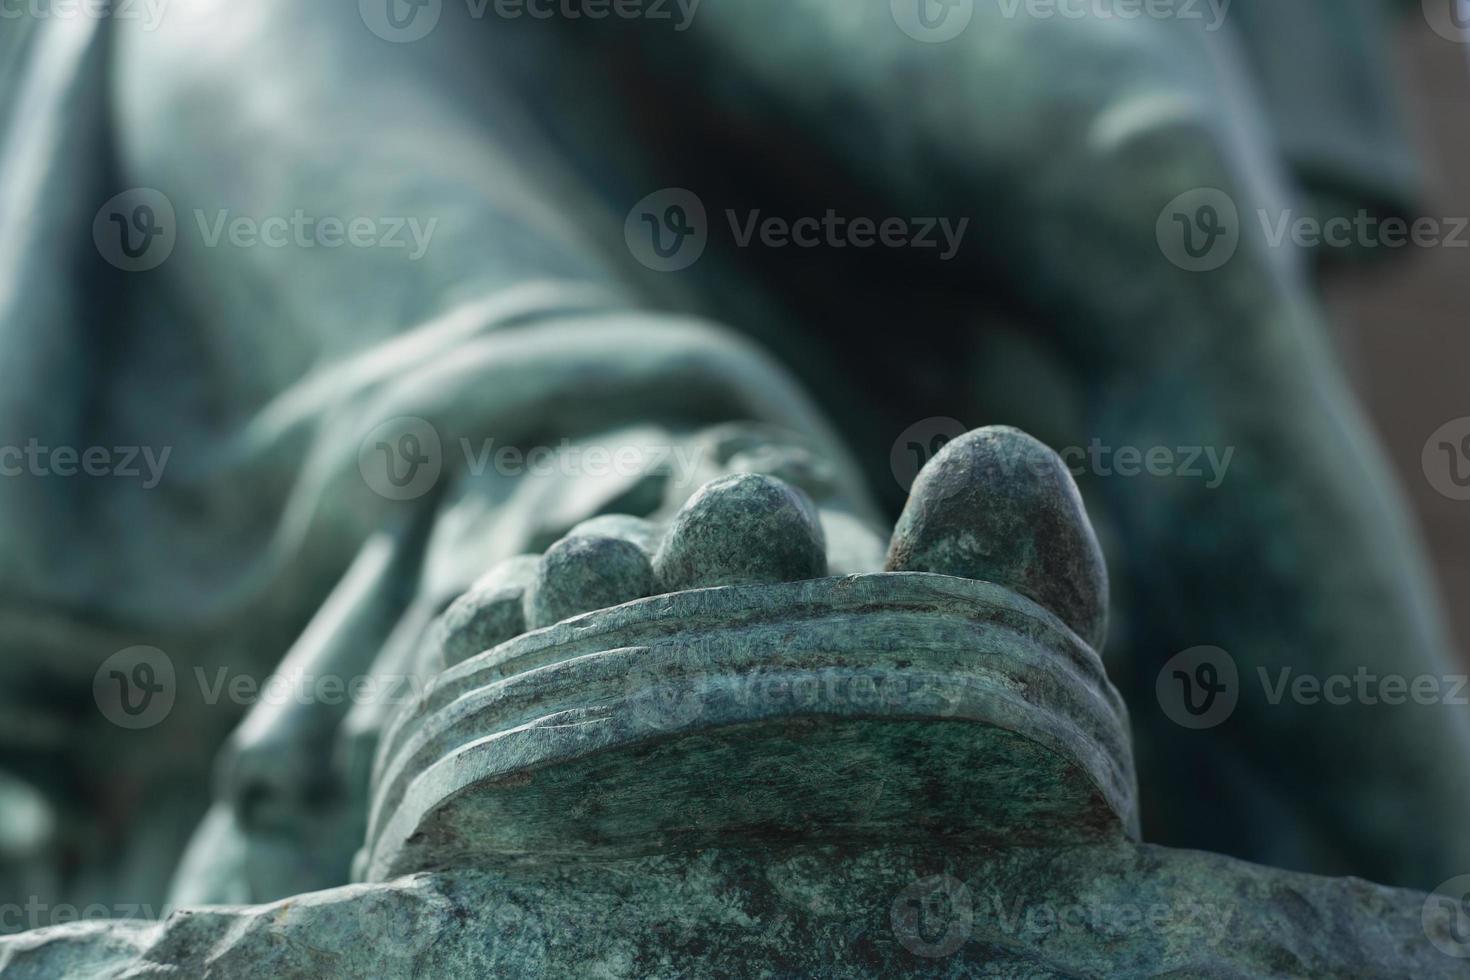 Greenish Sandled Foot of a Statue photo